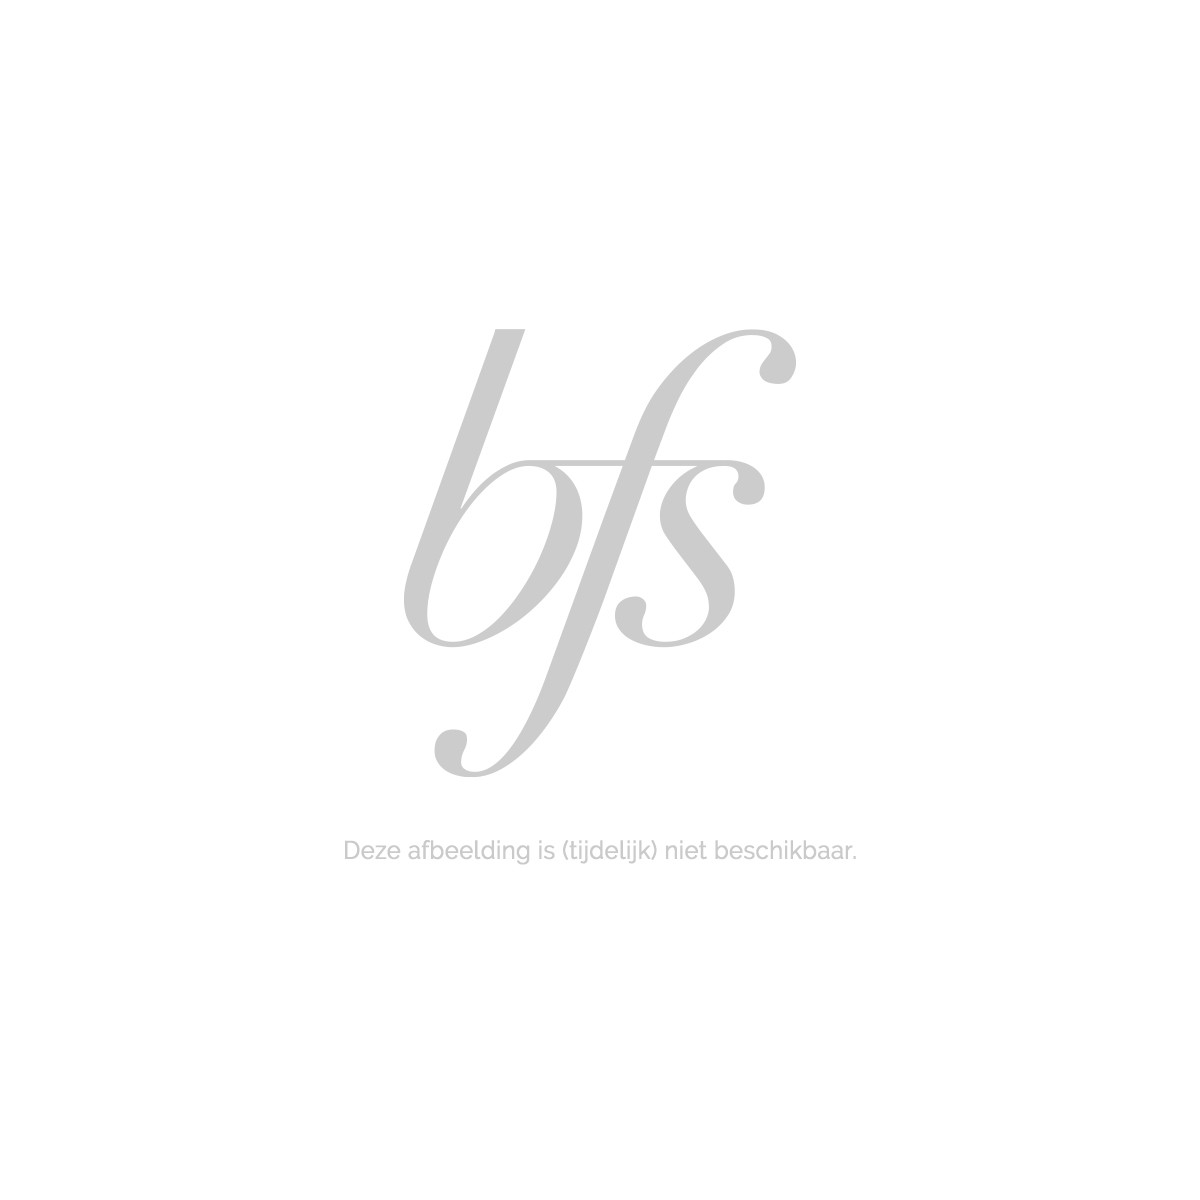 Lancome Definicils High Definition Mascara 6,50 Ml